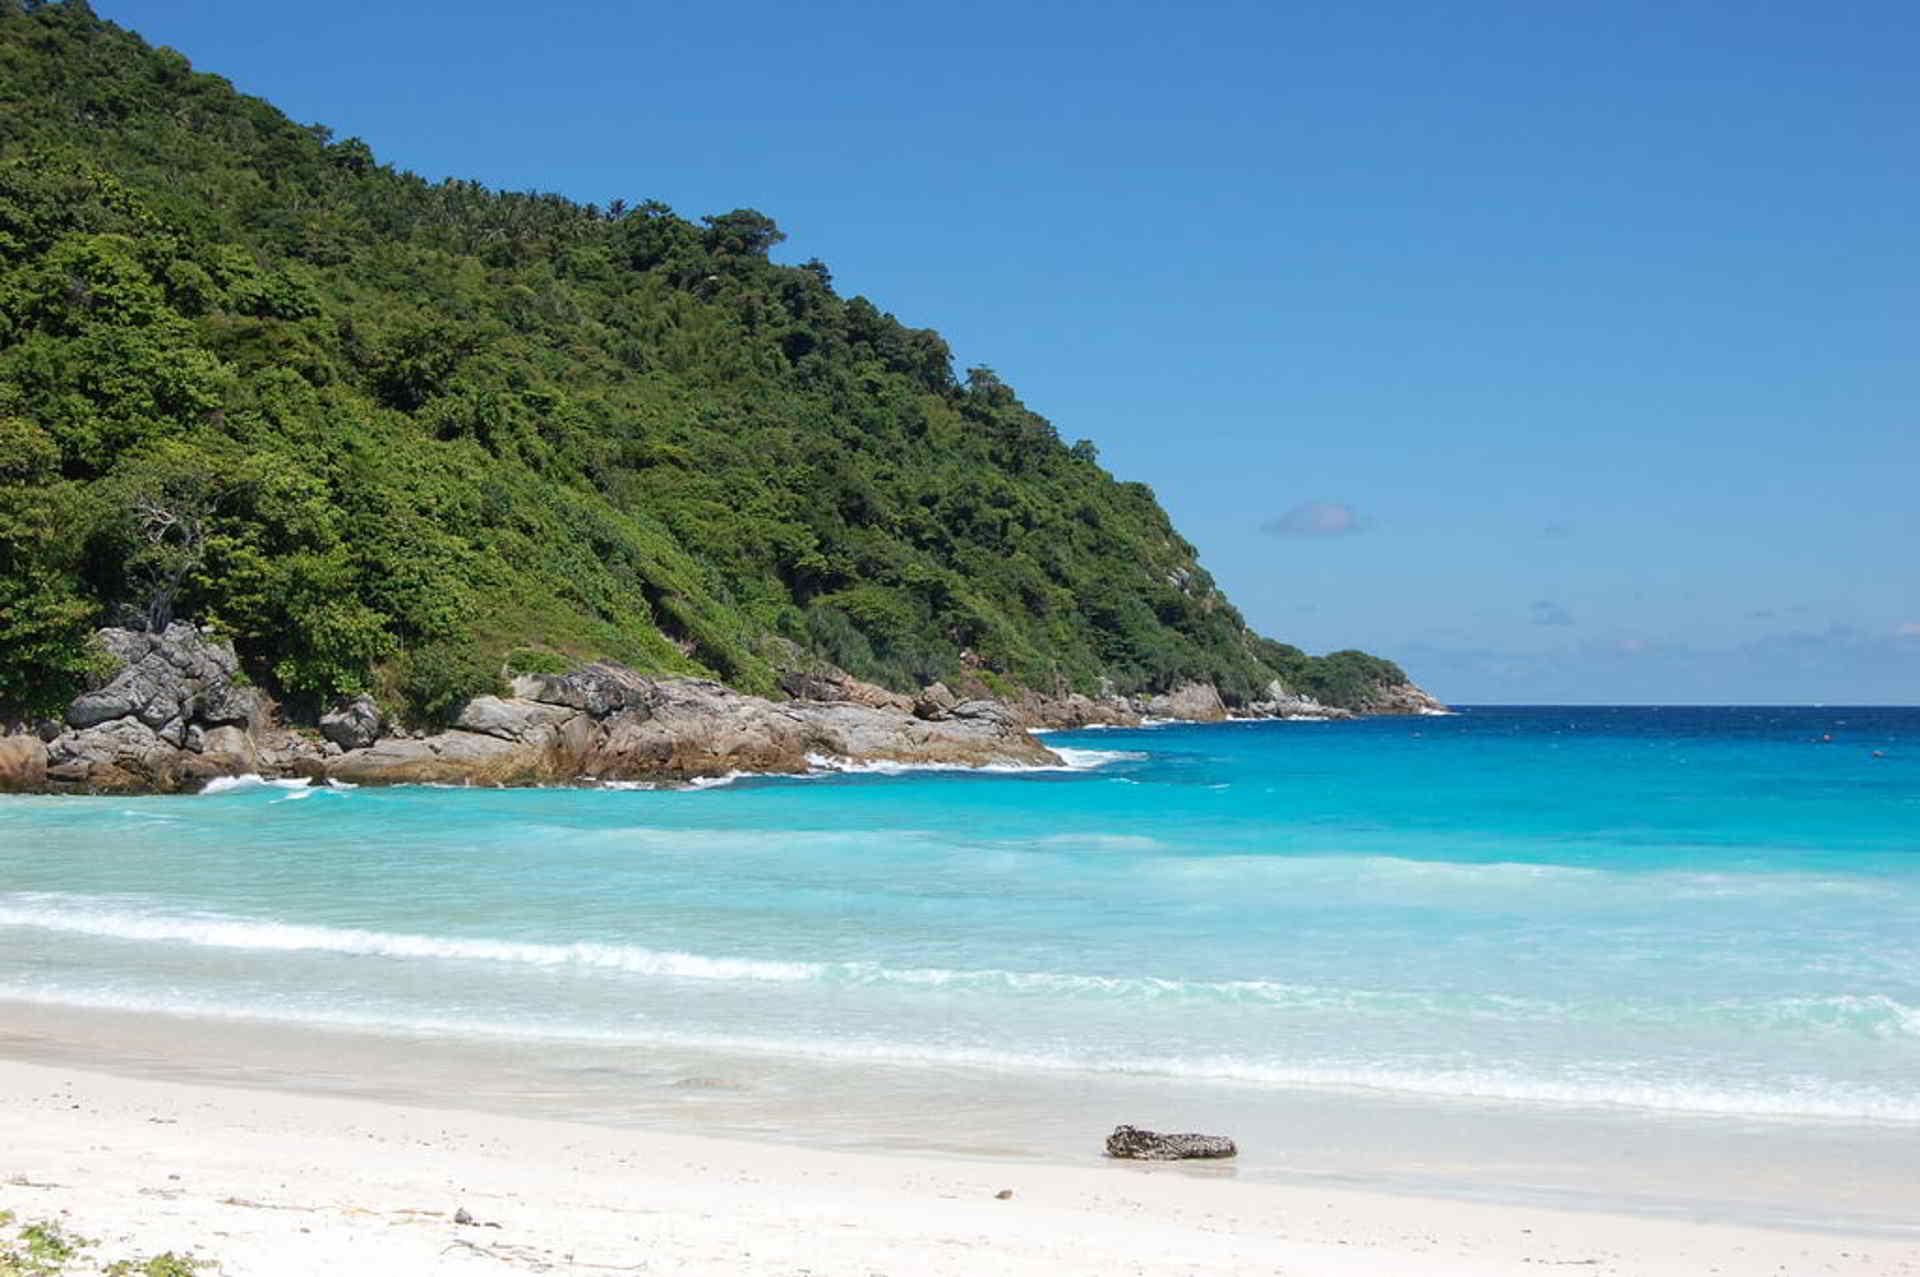 Koh Racha beach